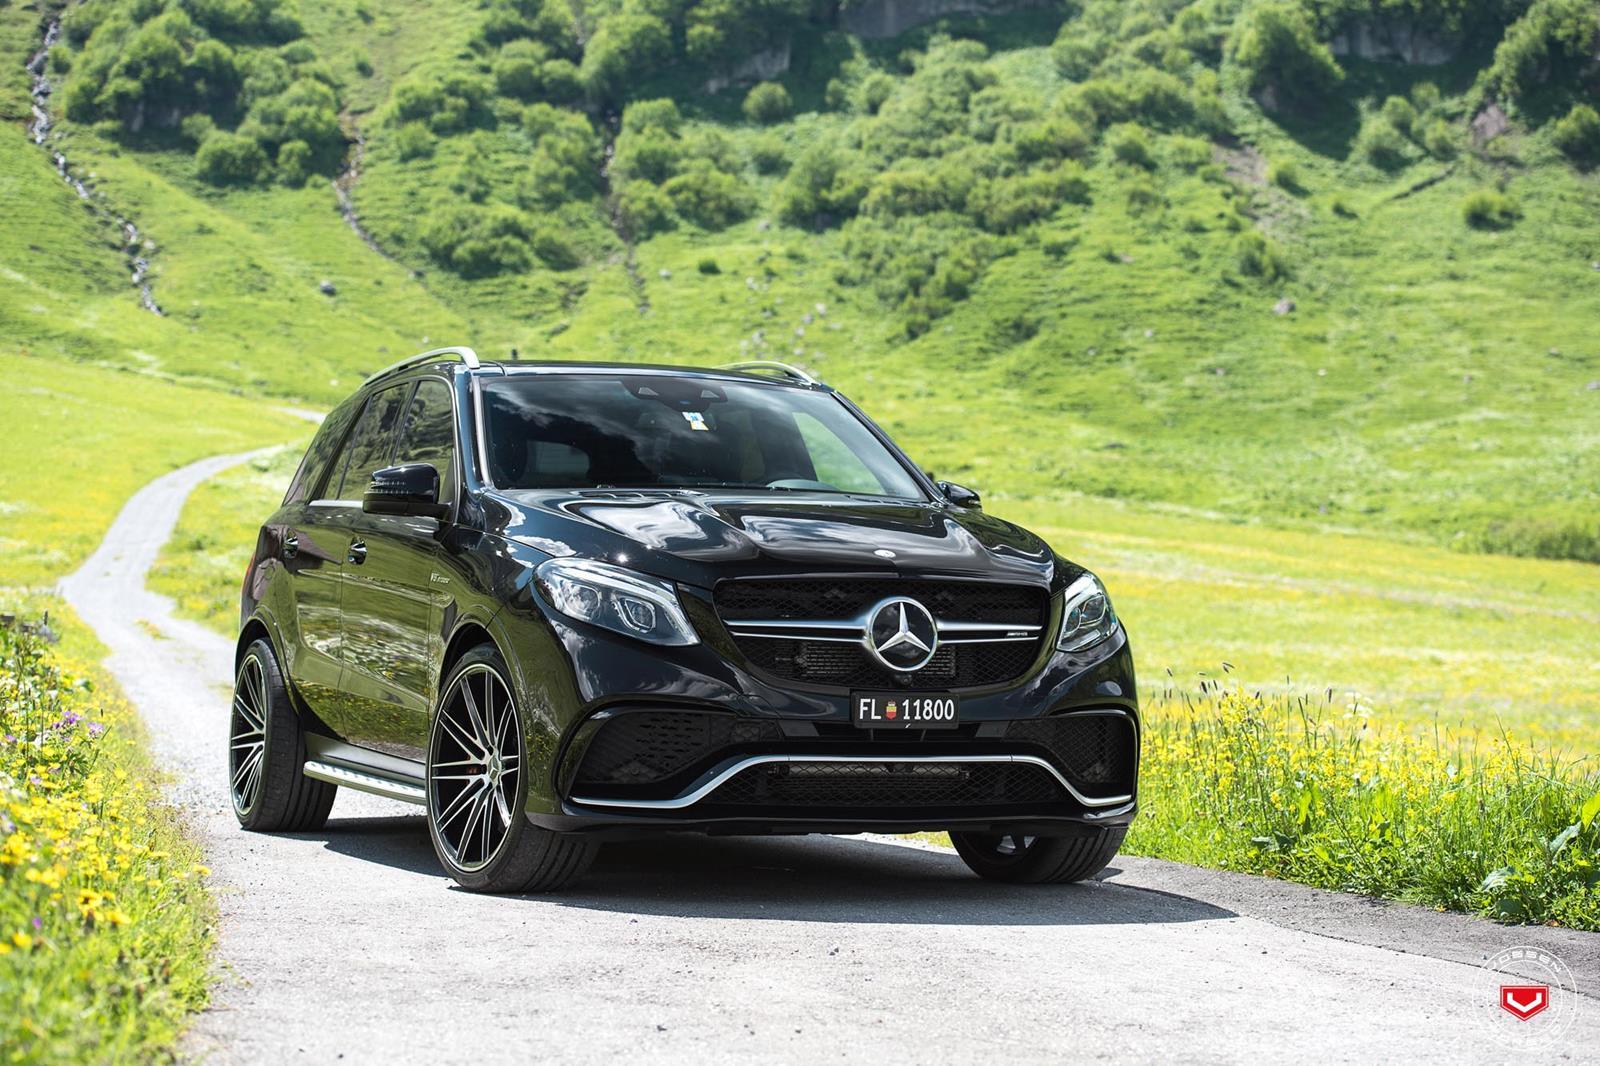 Mercedes Benz_GLE_VPS-307_05c0776b